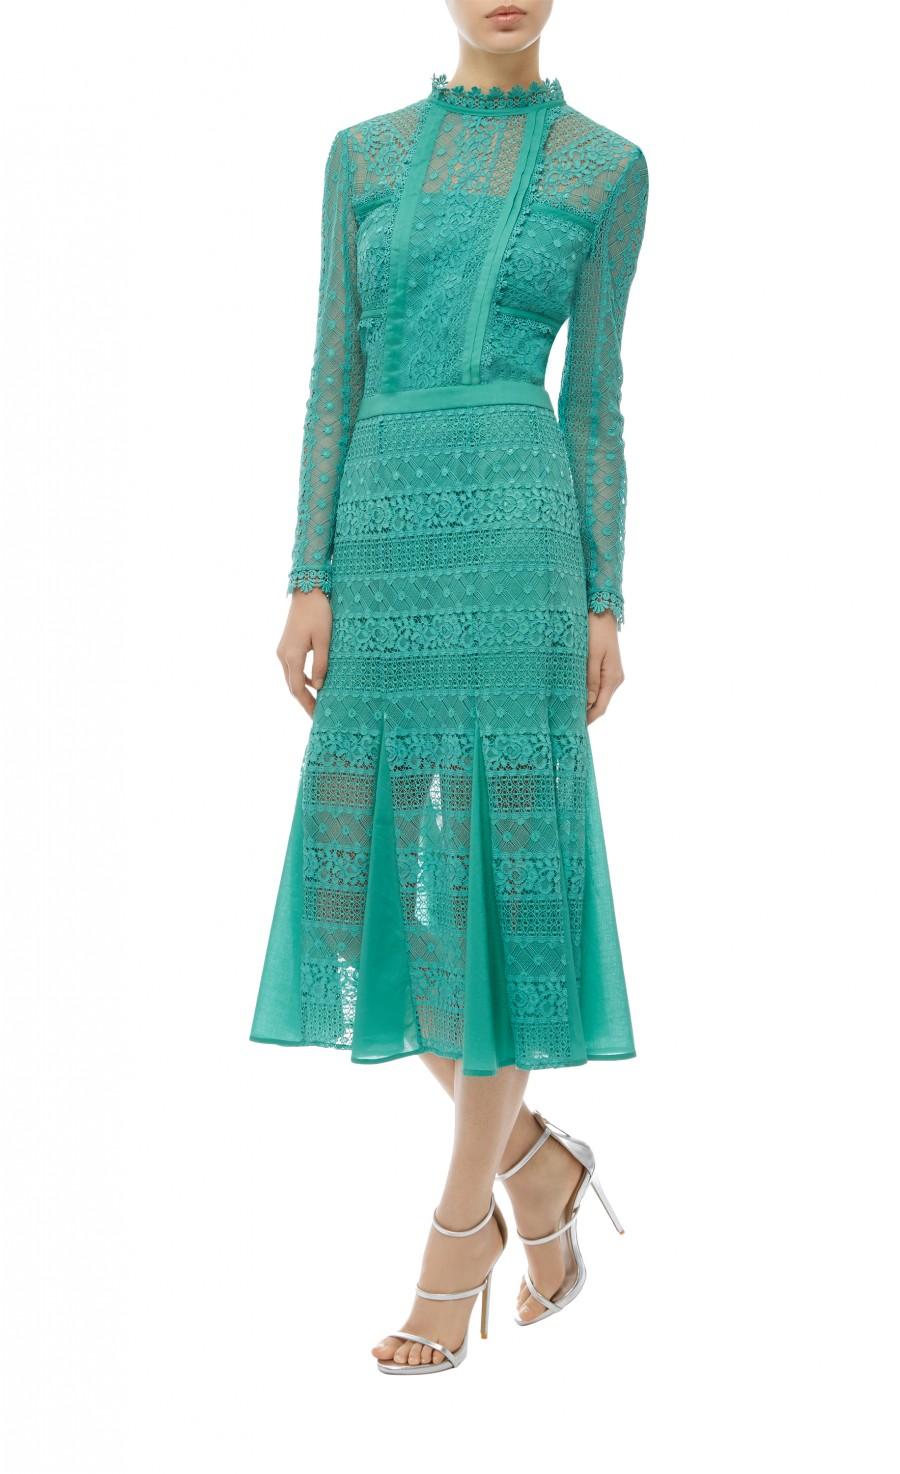 16a86151284_desdemona_lace_dress_jade_b_retouched